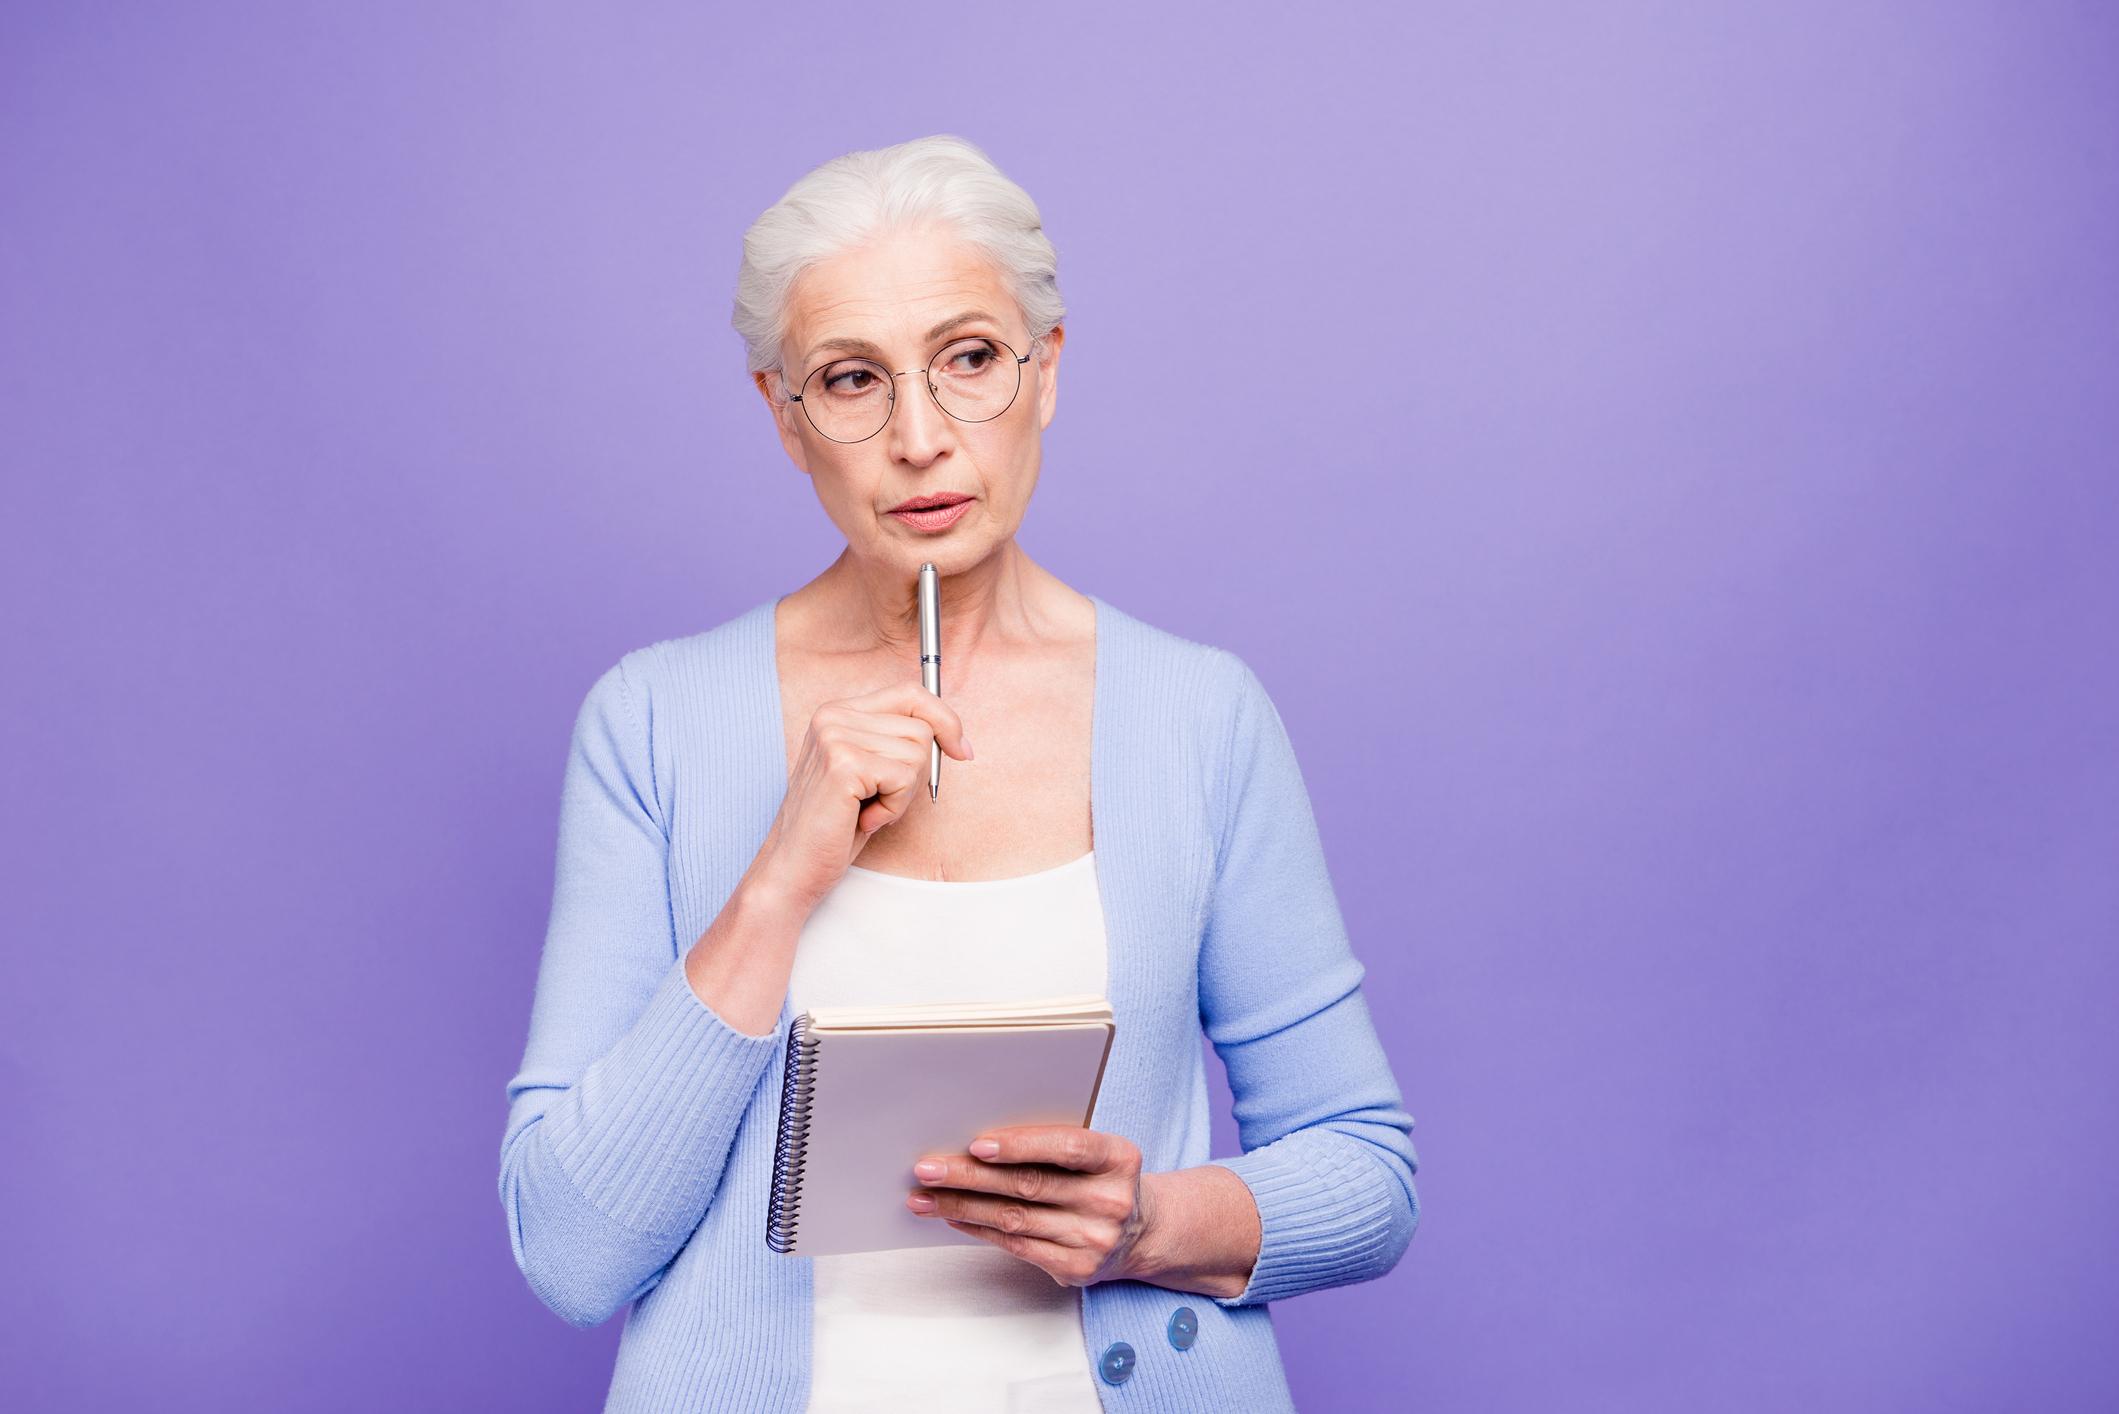 retirement planning questions